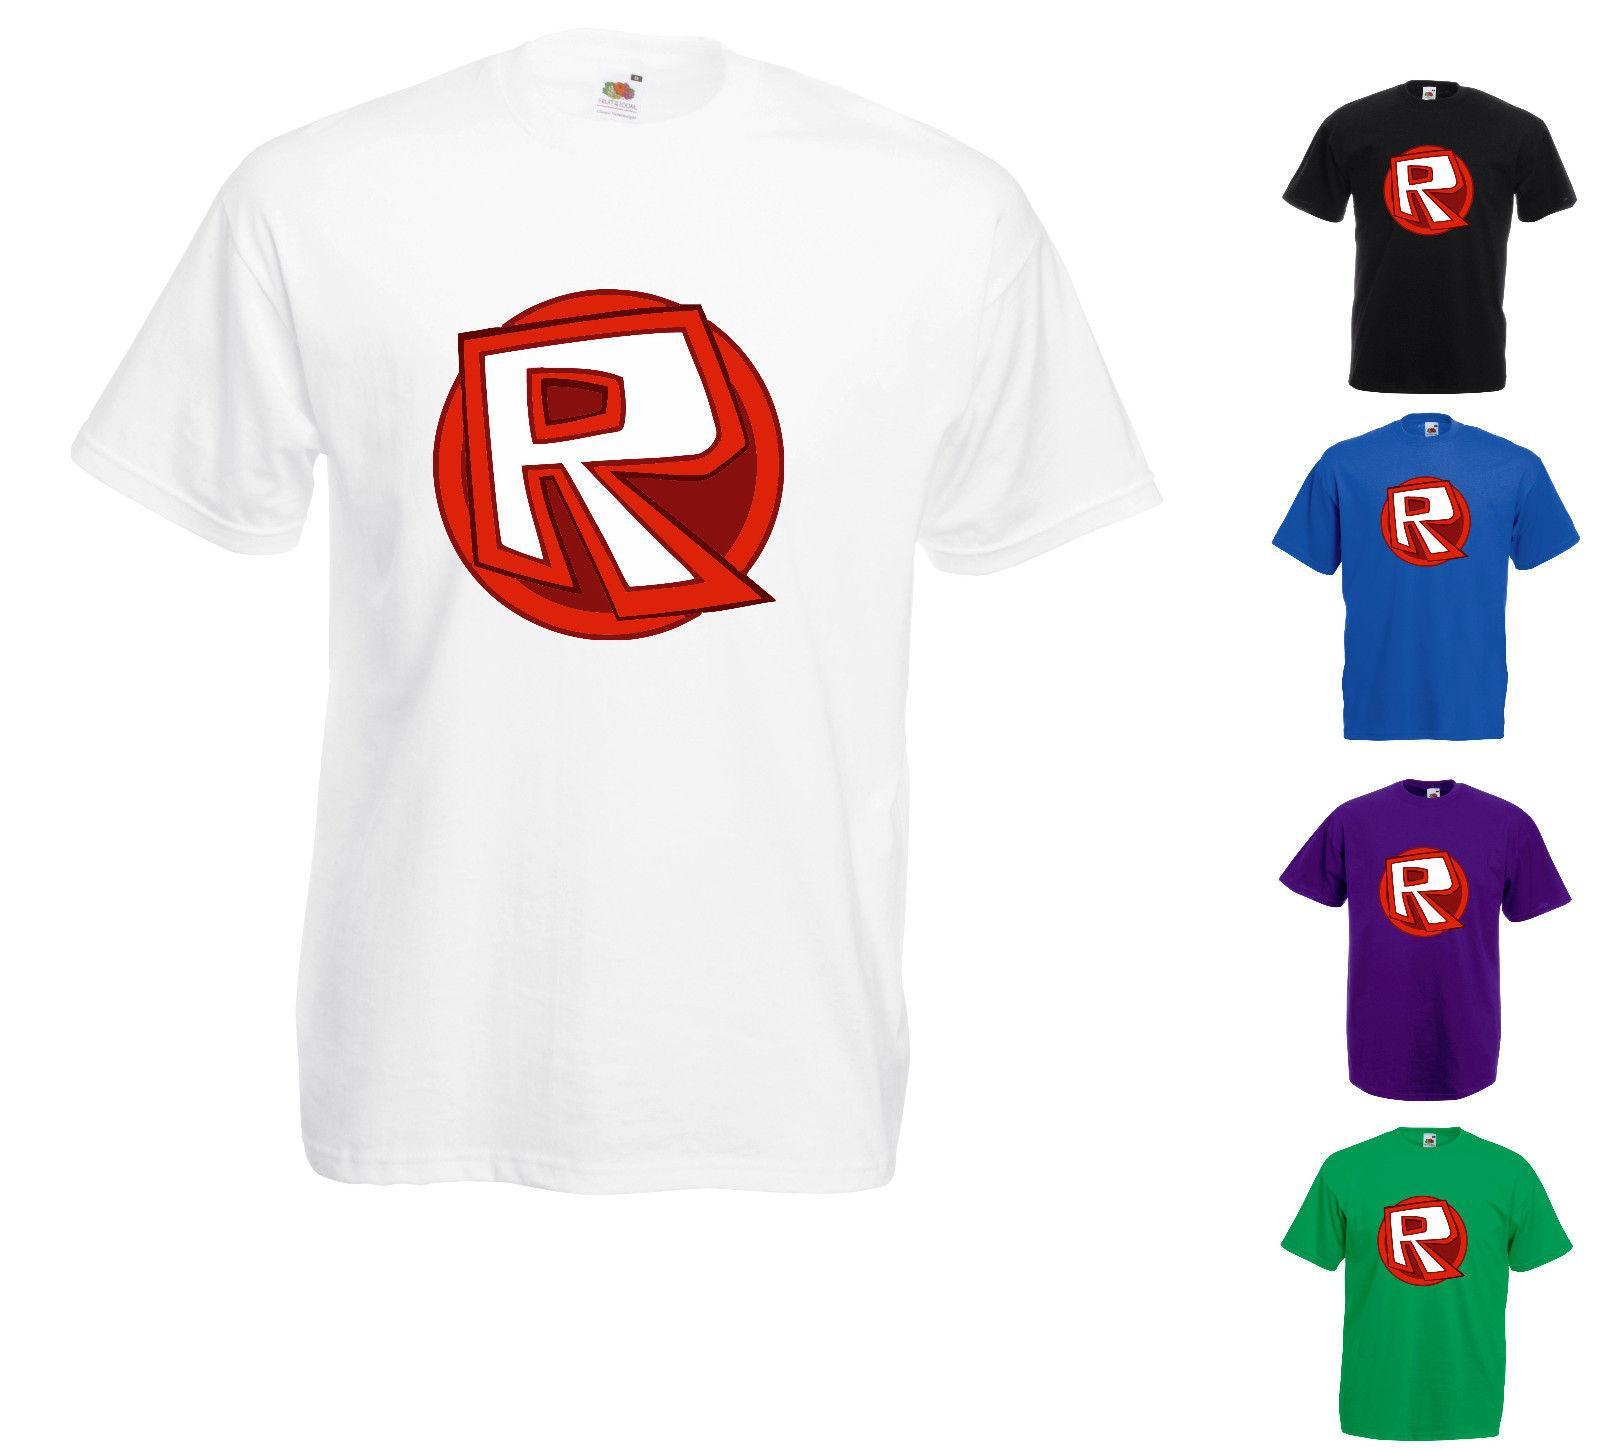 r logo roblox Roblox R Circle Logo Printed T Shirt Gaming Funny Unisex Casual Tee Gift Mens Shirt Printed Shirts From Tee Spirit 12 96 Dhgate Com